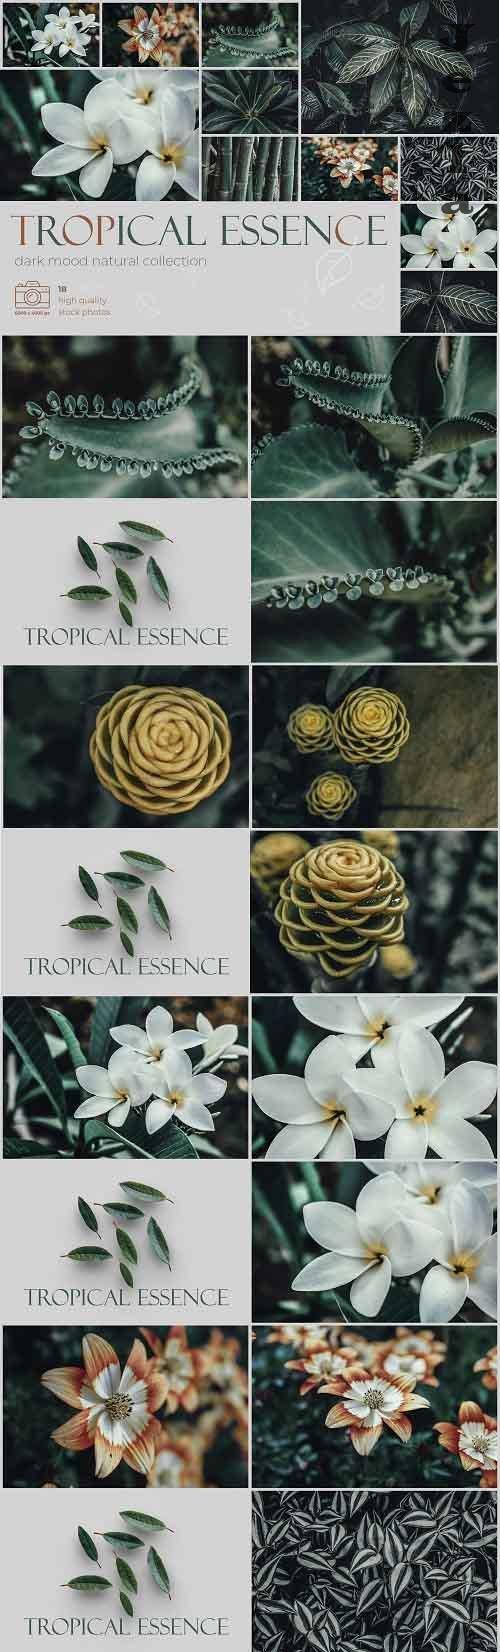 Tropical Essence. Photo bundle - 4868748